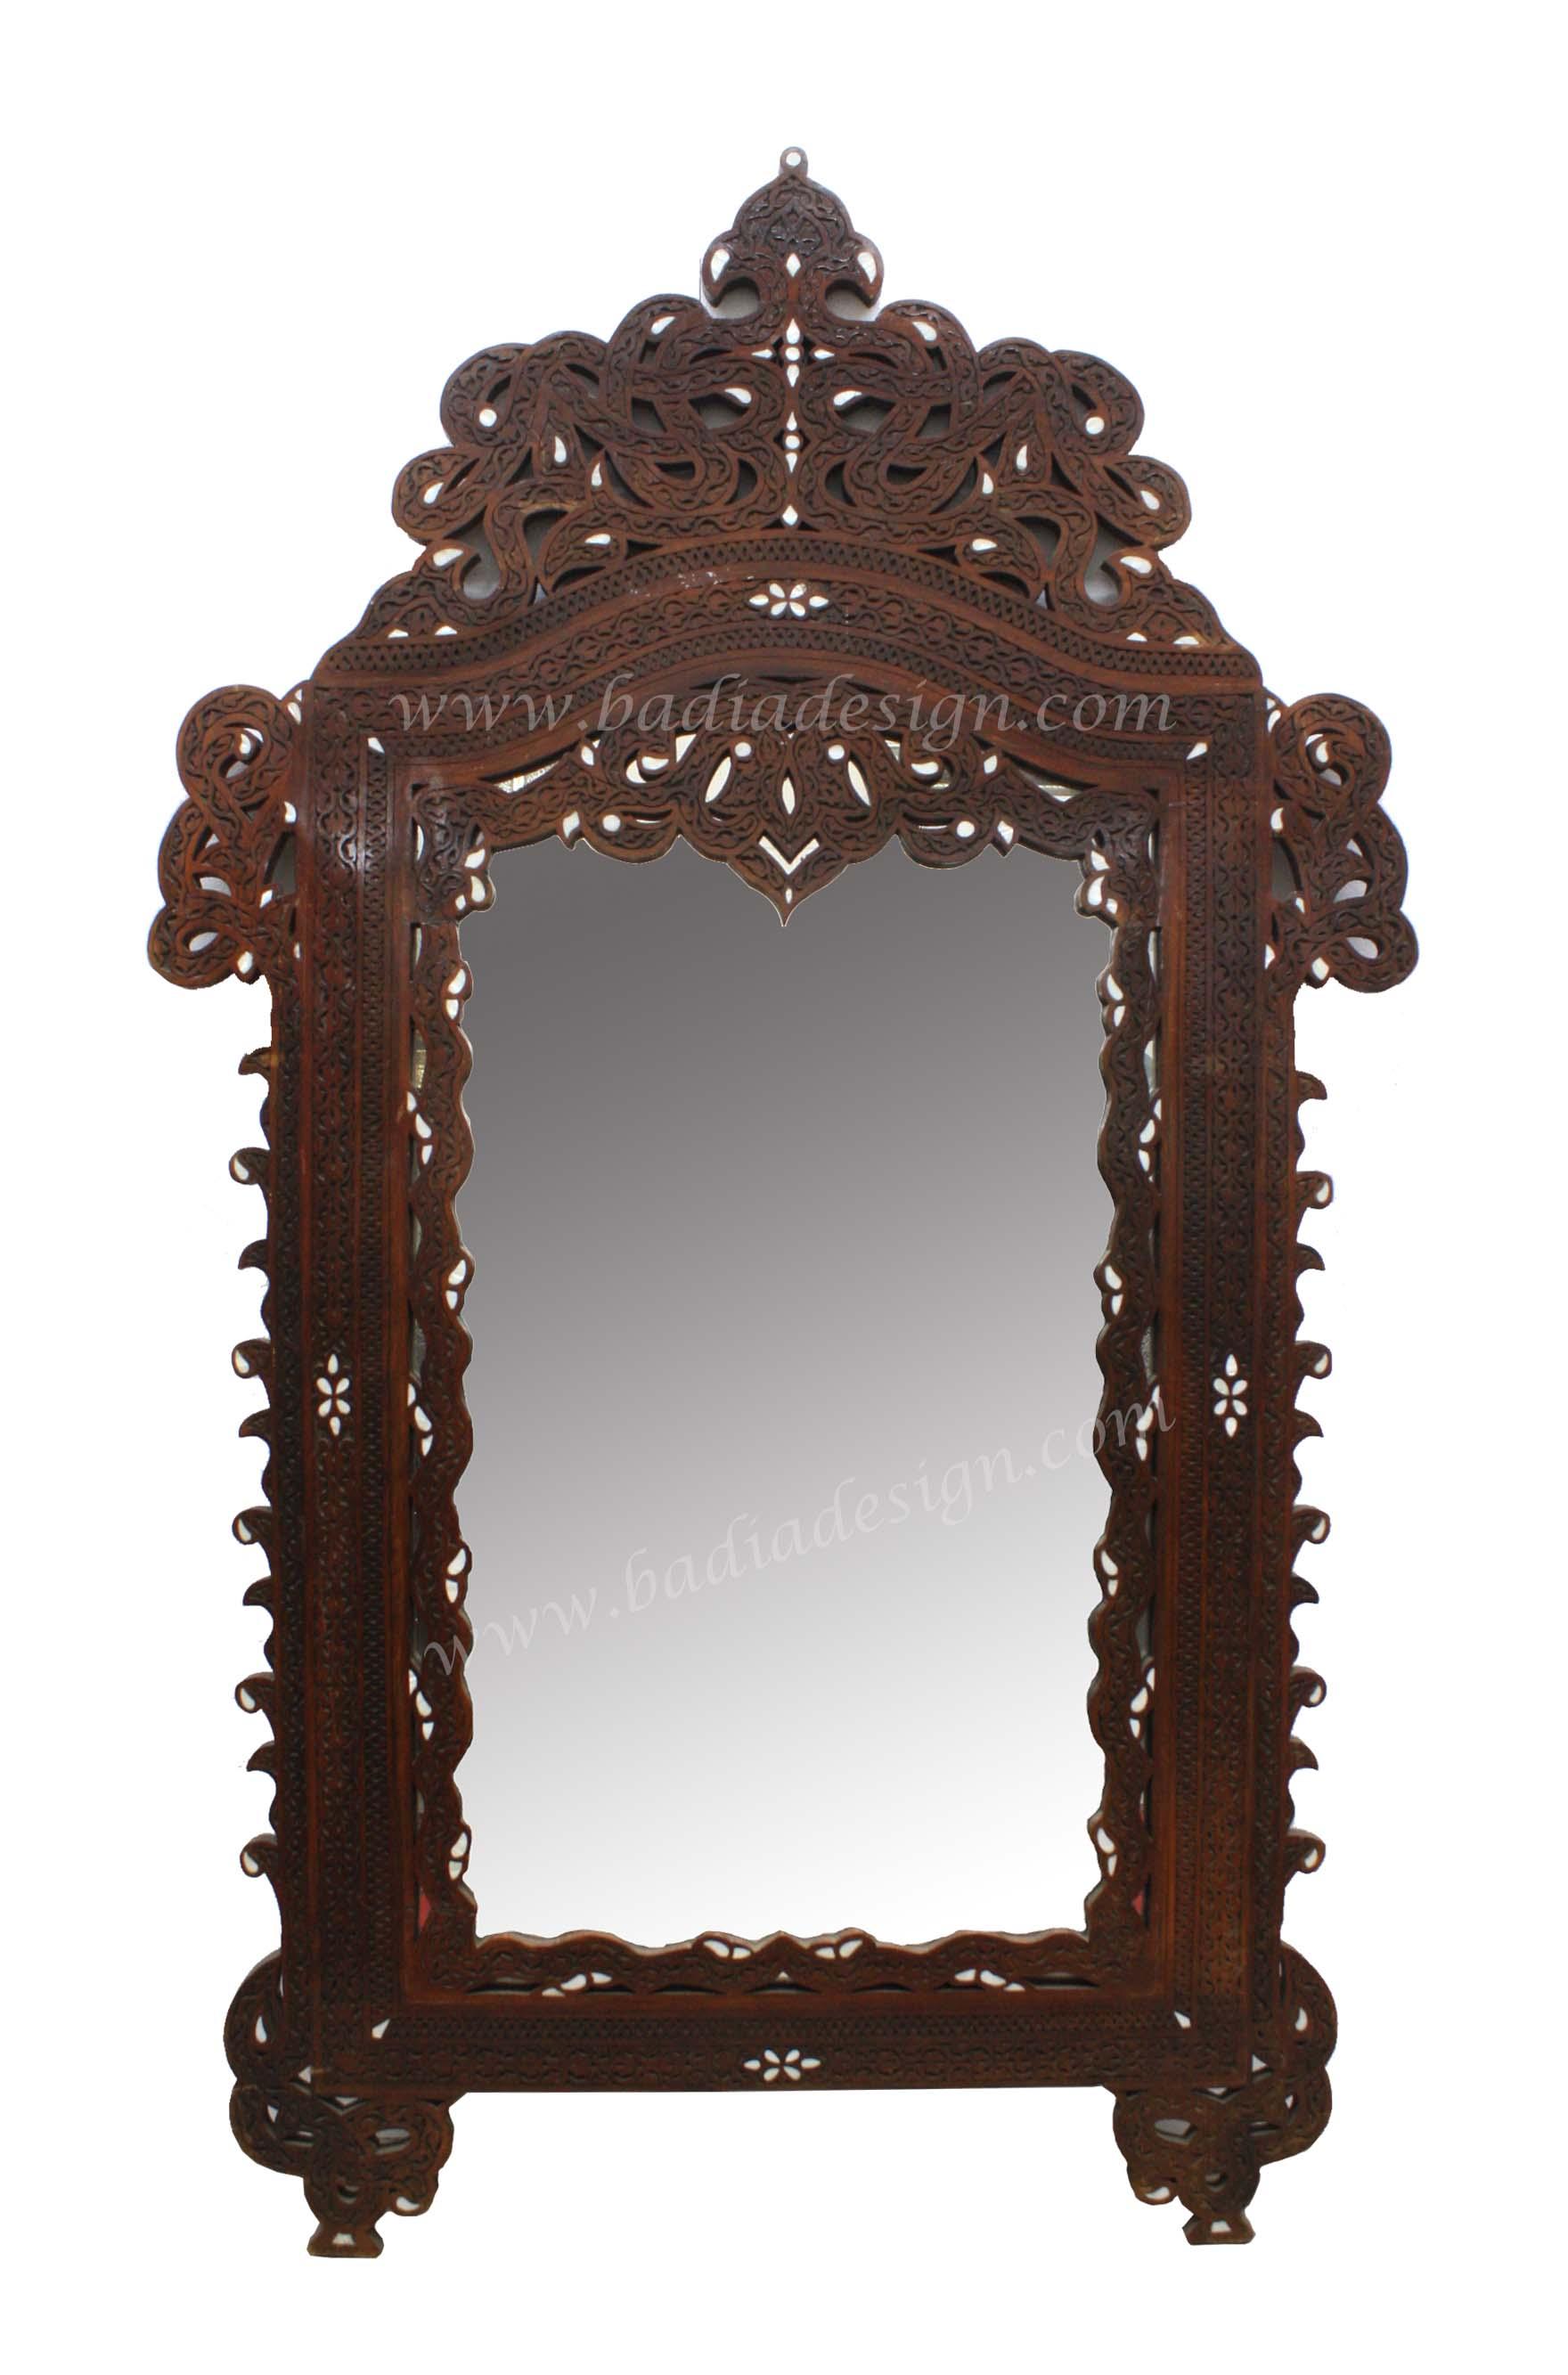 tall-moroccan-bone-inlay-mirror-m-mop029.jpg